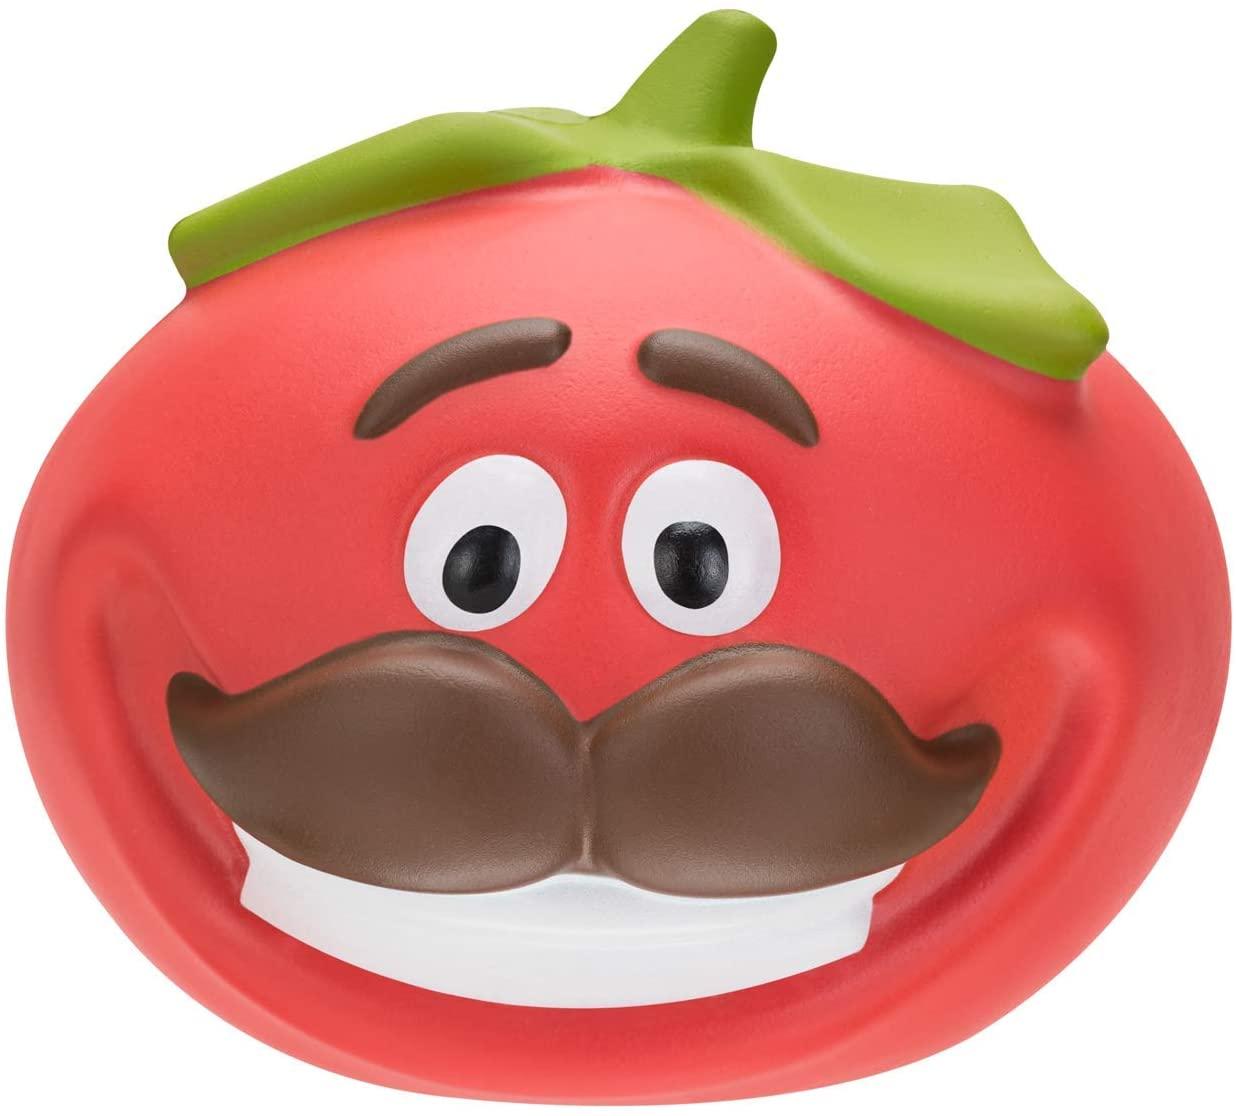 Fortnite Loot Foam Squishy, Tomatohead